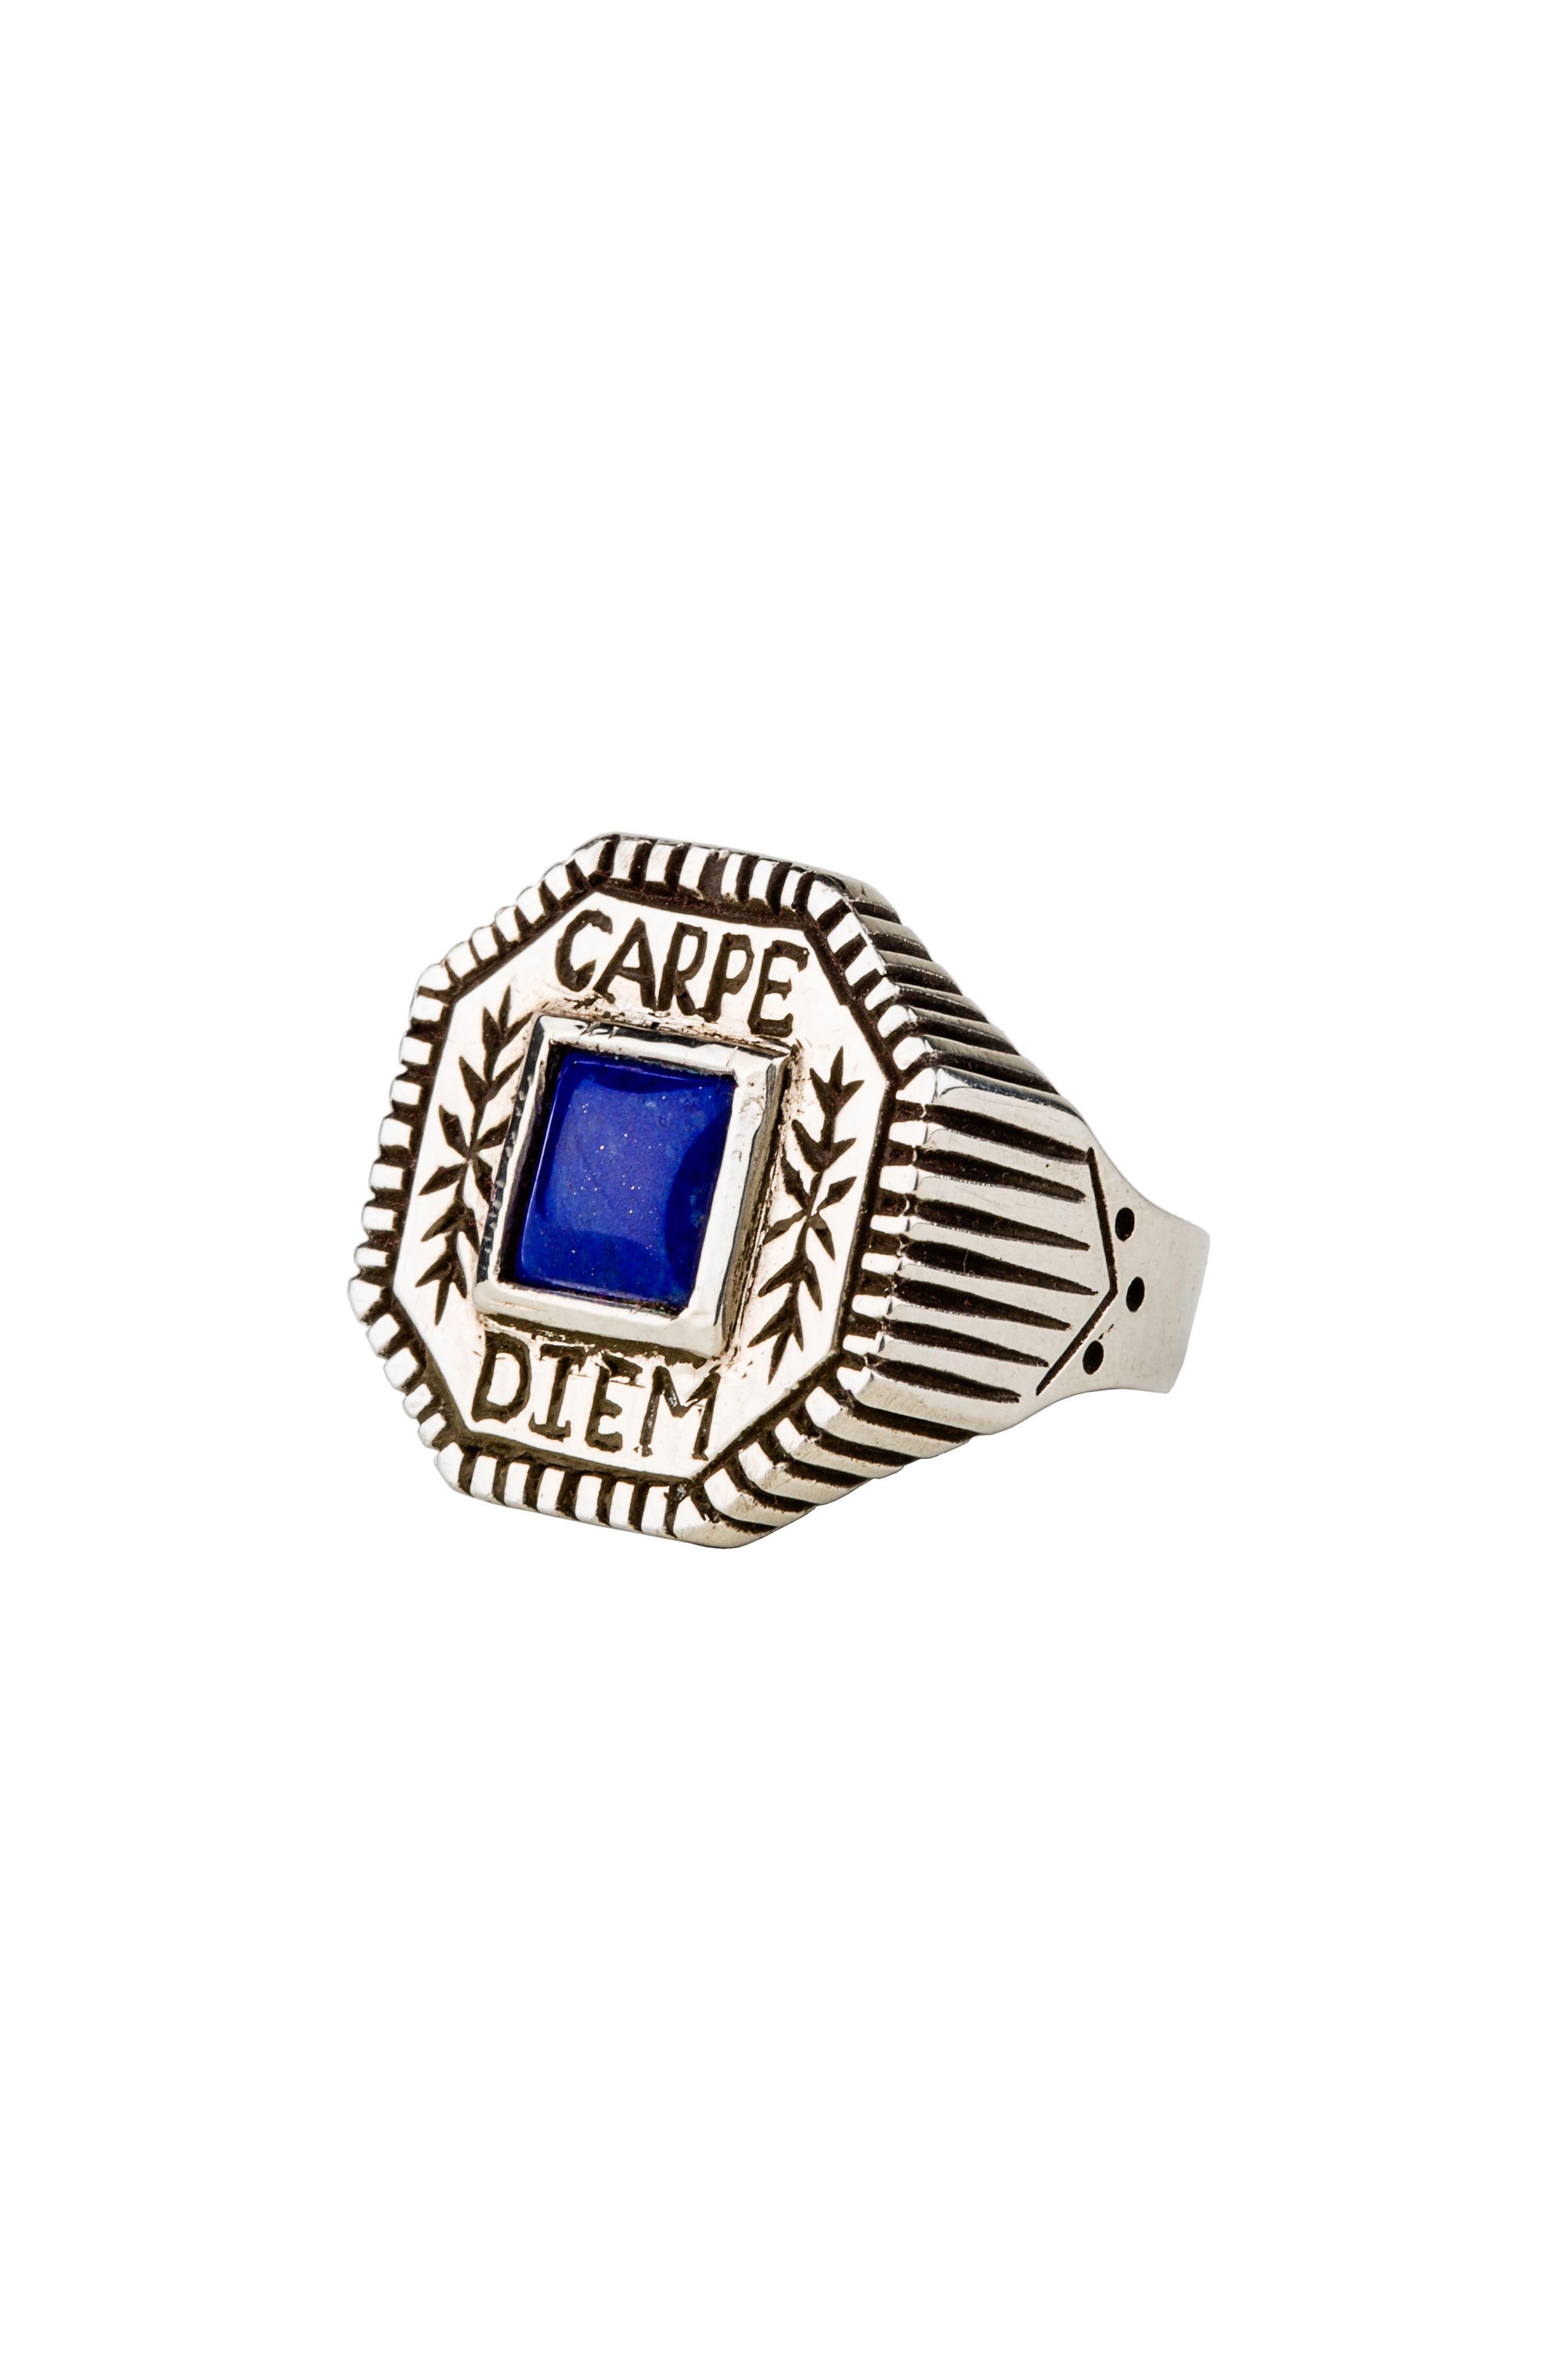 Carpe Diem Ring,                         Main,                         color, Blue